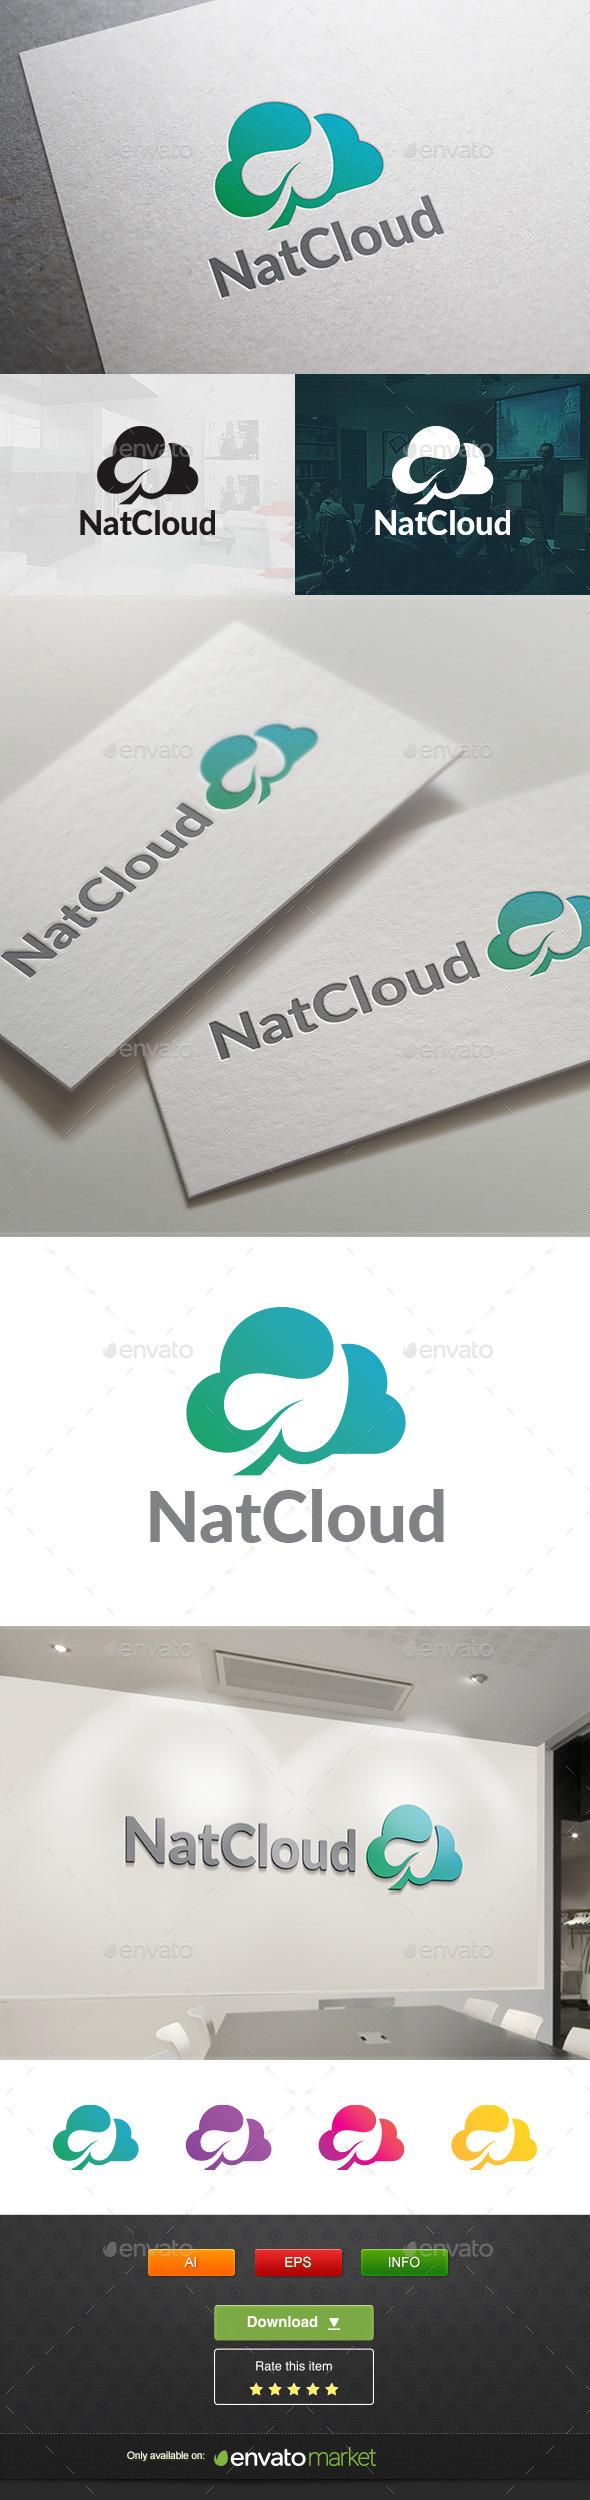 GraphicRiver Natcloud 11764802